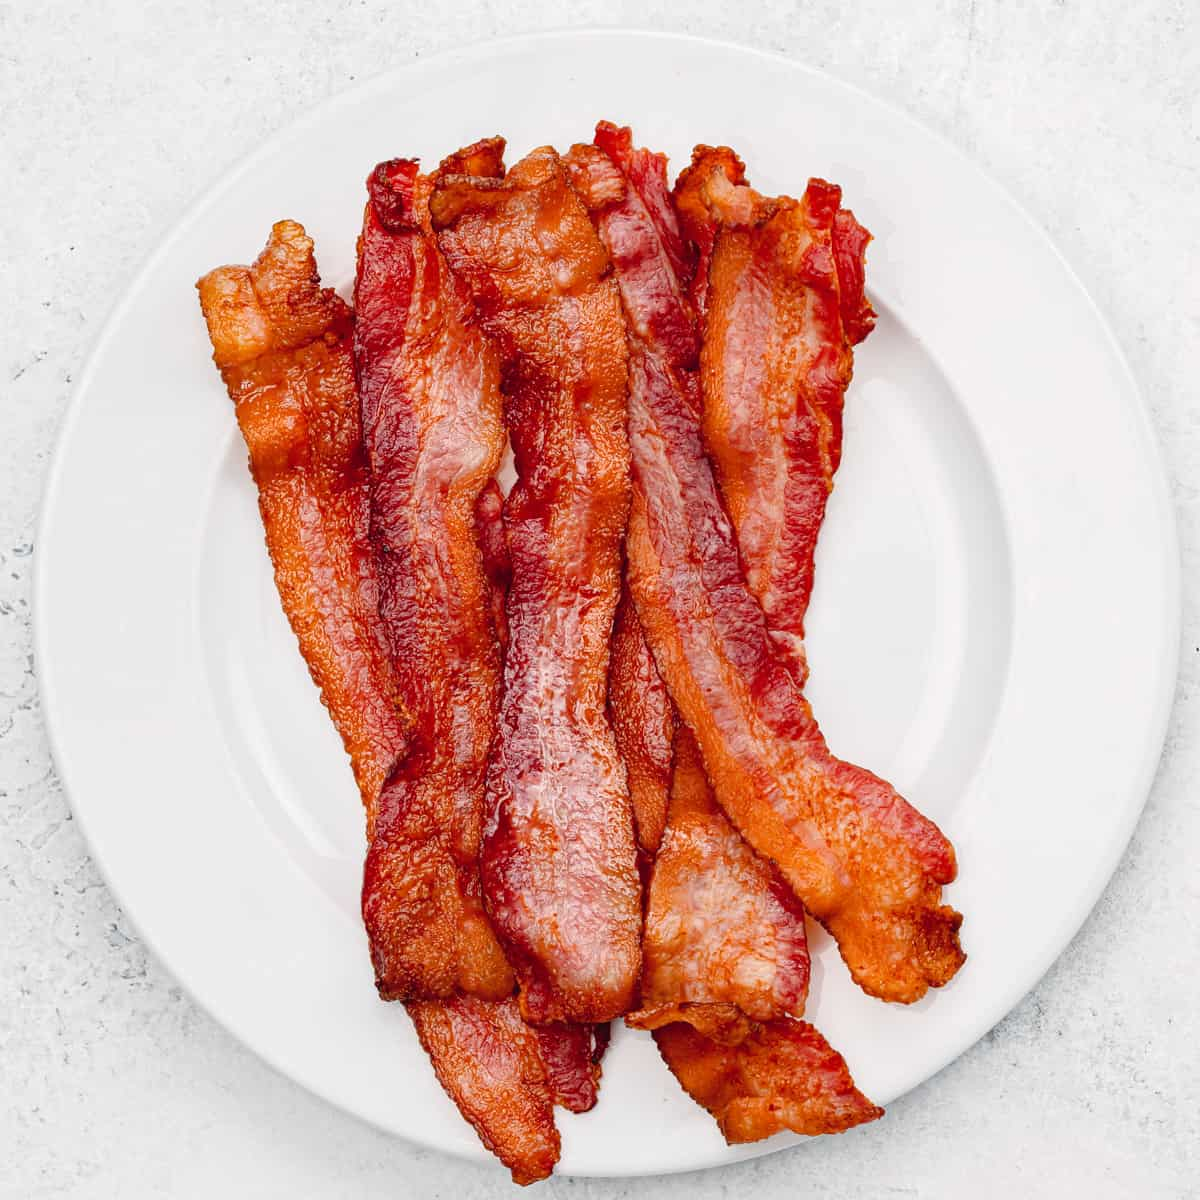 Crispy bacon.